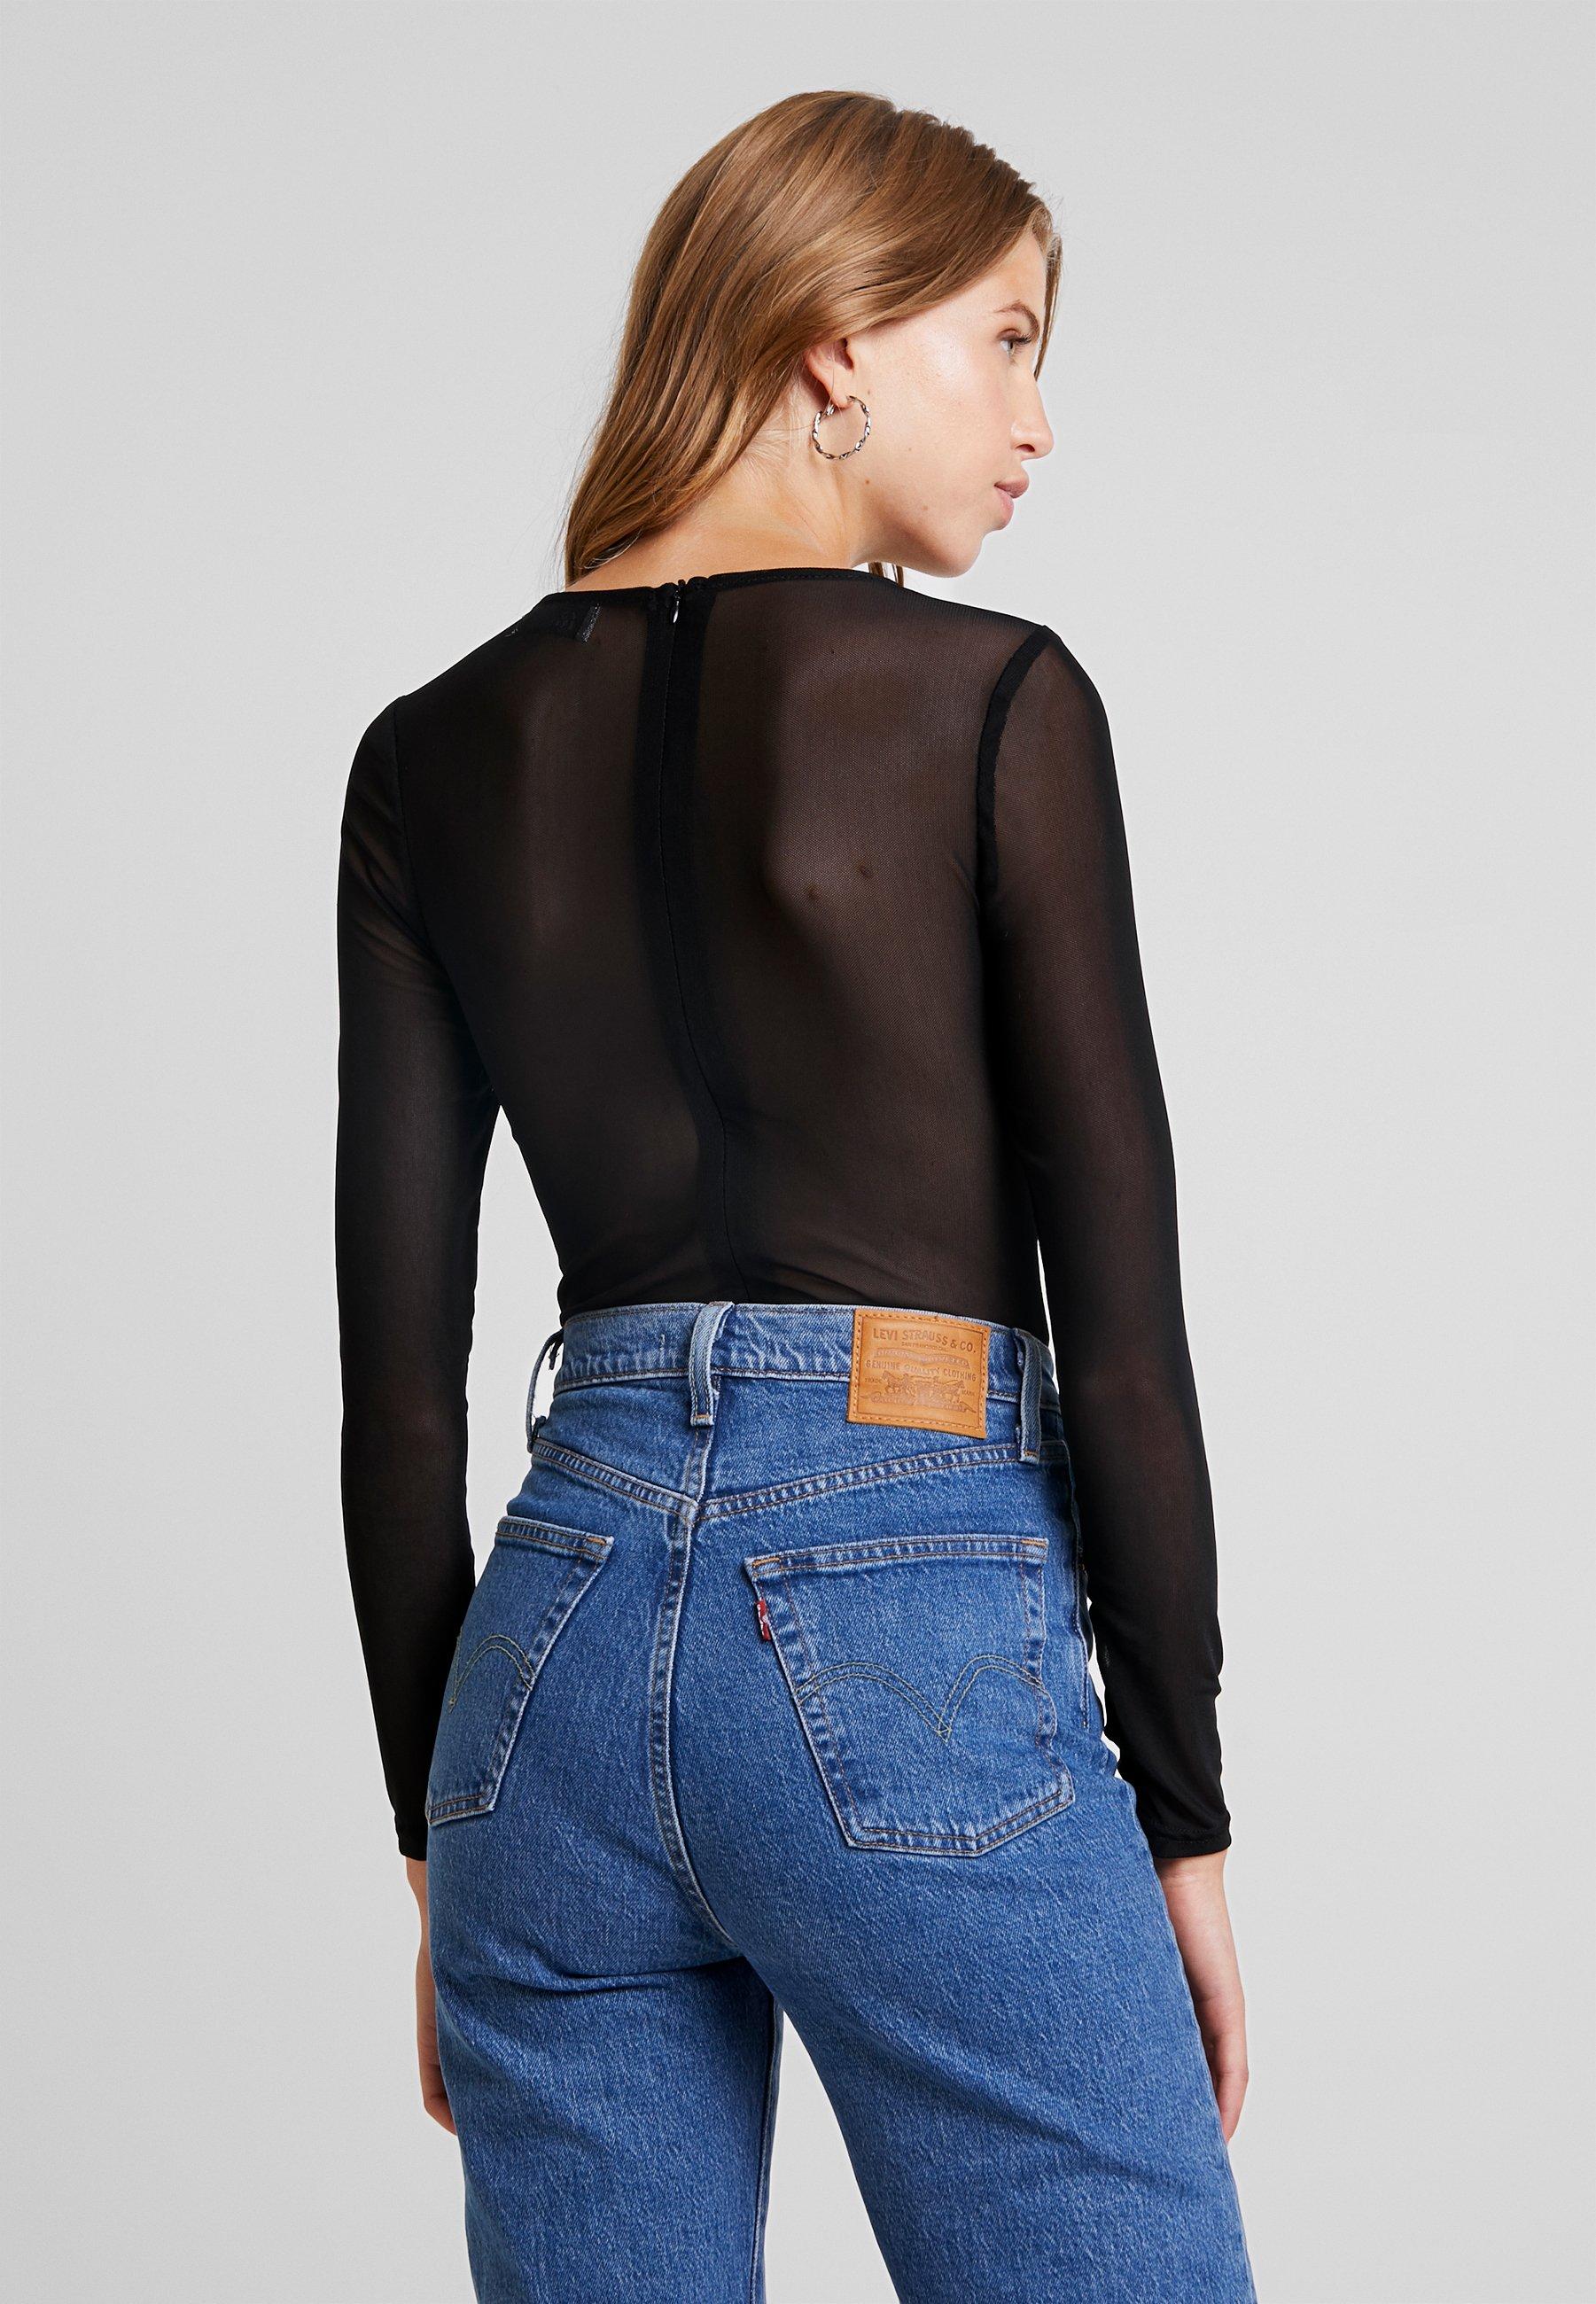 manches Bracken black Molly BODYT shirt à longues LADIES PXwkiuTOZ